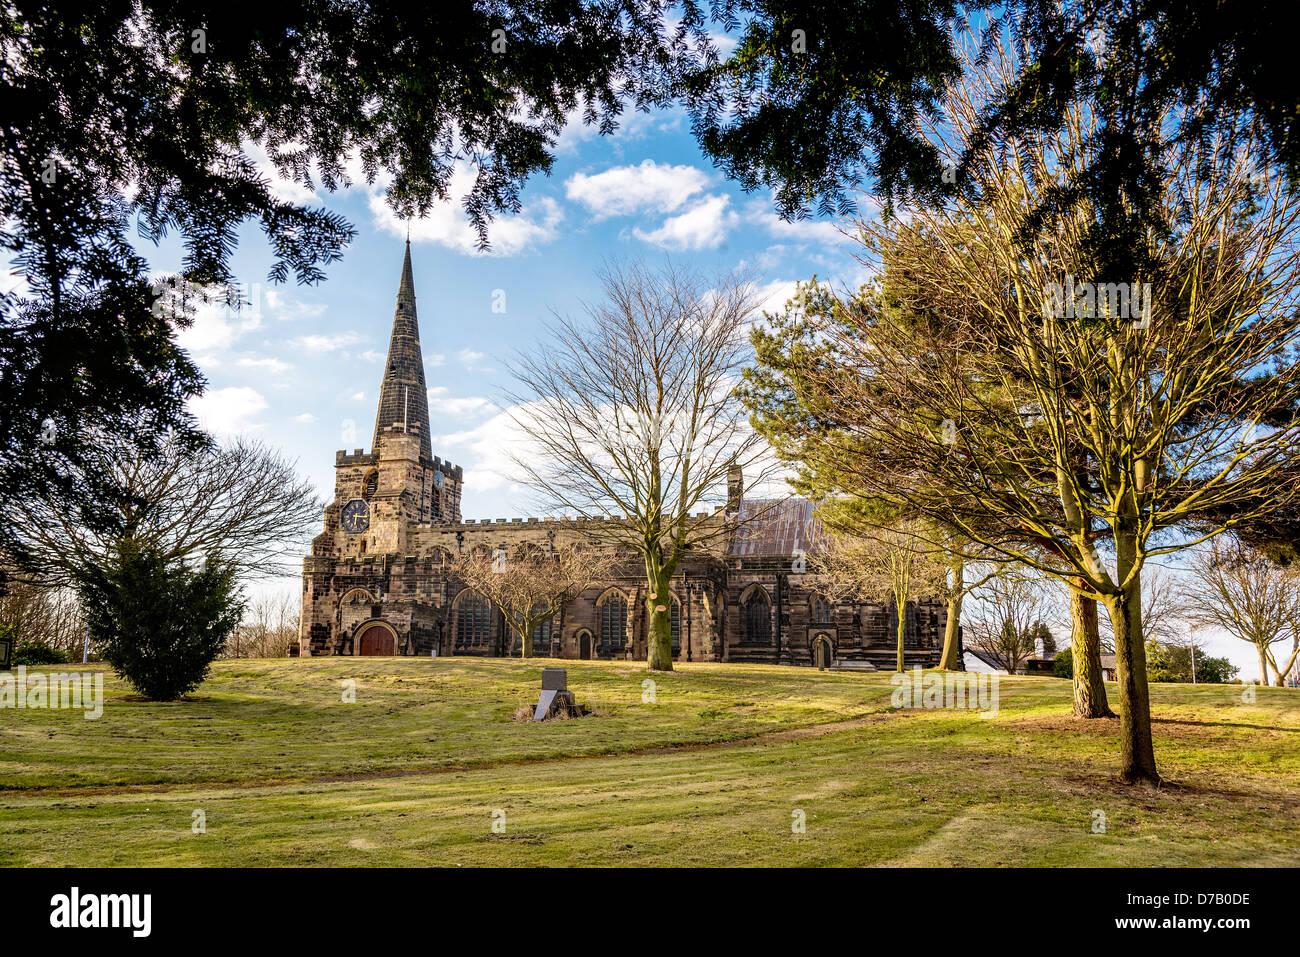 St Oswald's parish church at Winwick. - Stock Image